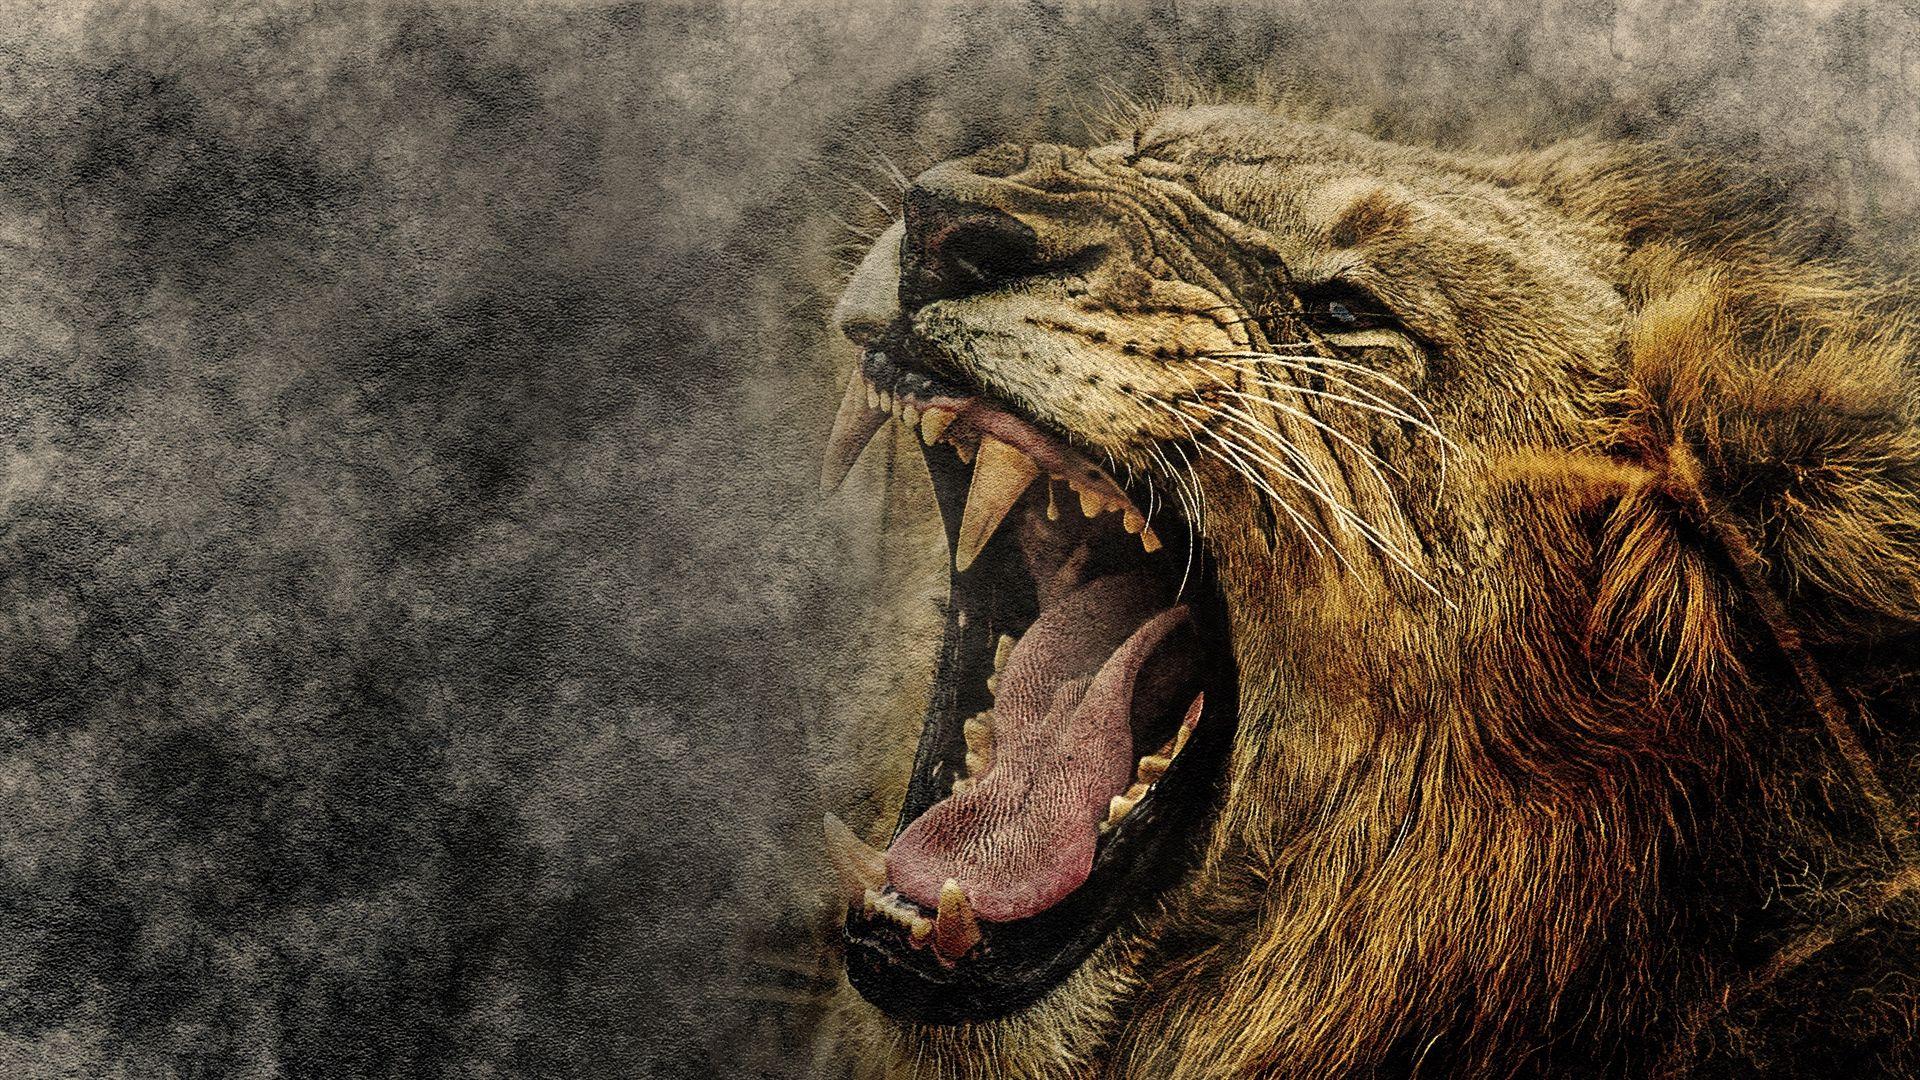 Lion Art Free Desktop Wallpaper